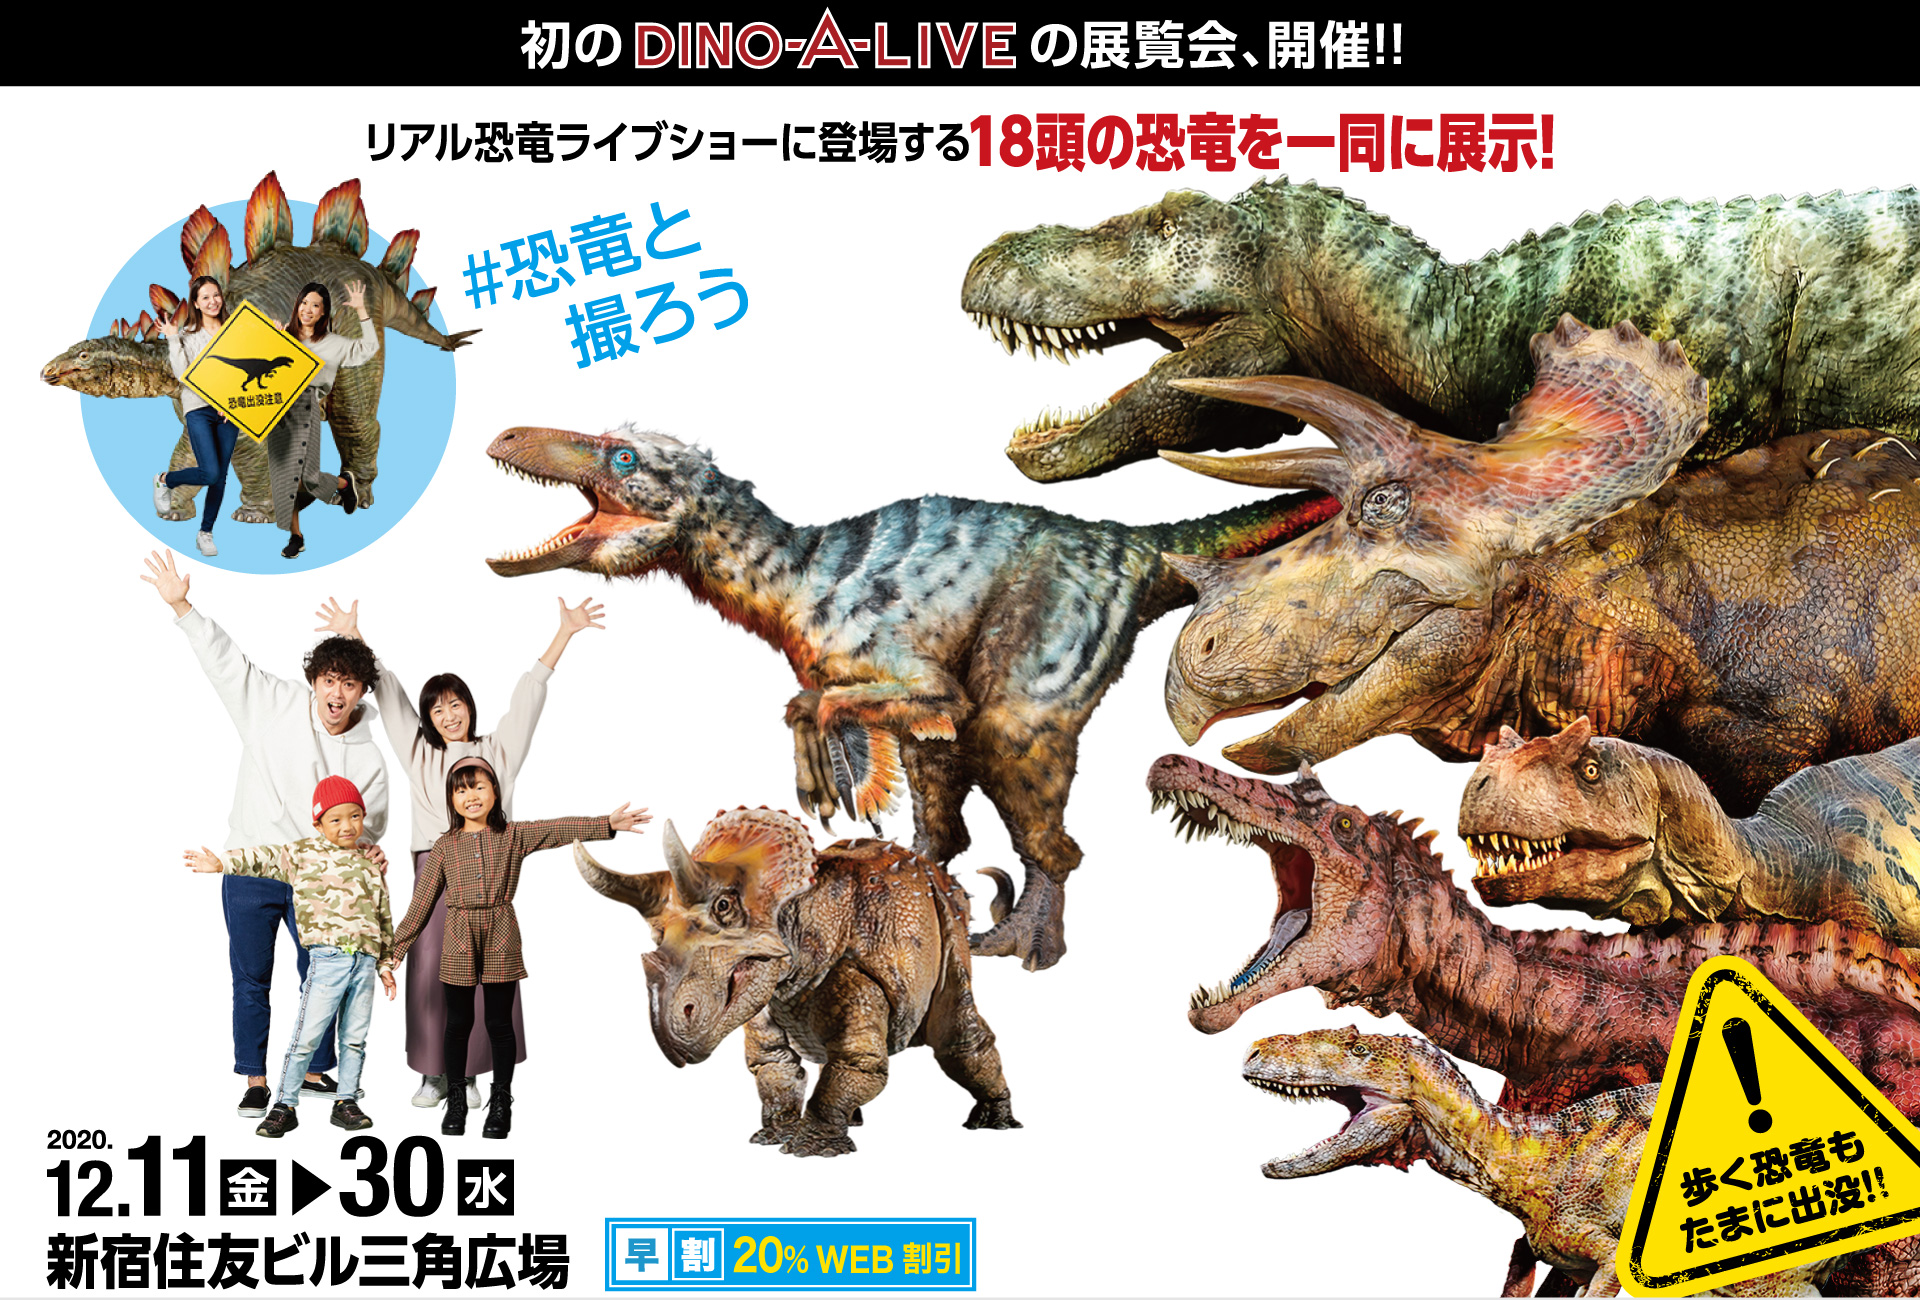 AMAZING DINOSAURS ART EXHIBITION ディノアライブの恐竜たち展